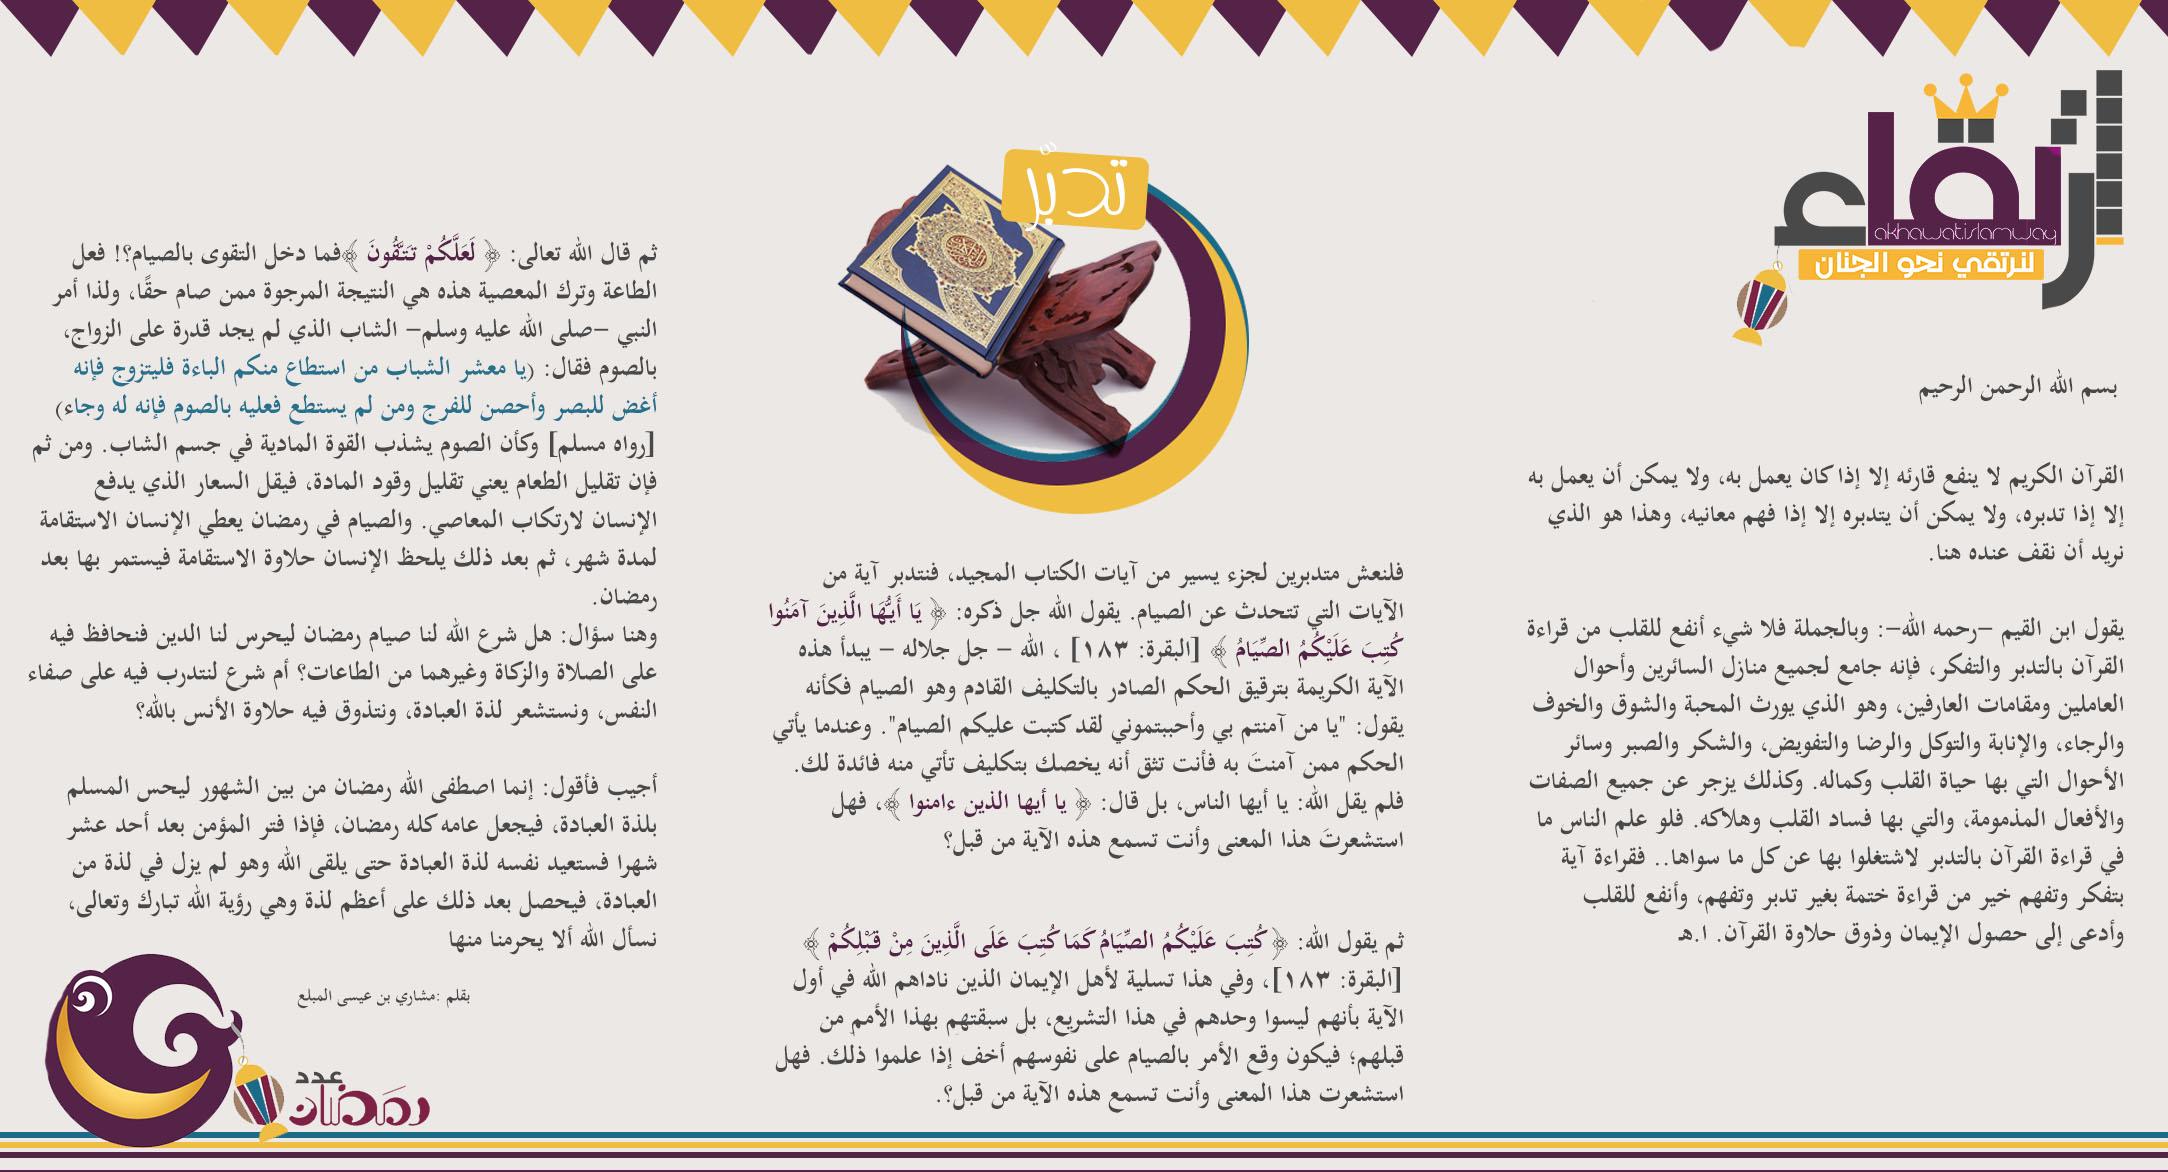 akhawat_islamway_1495227299__2.jpg